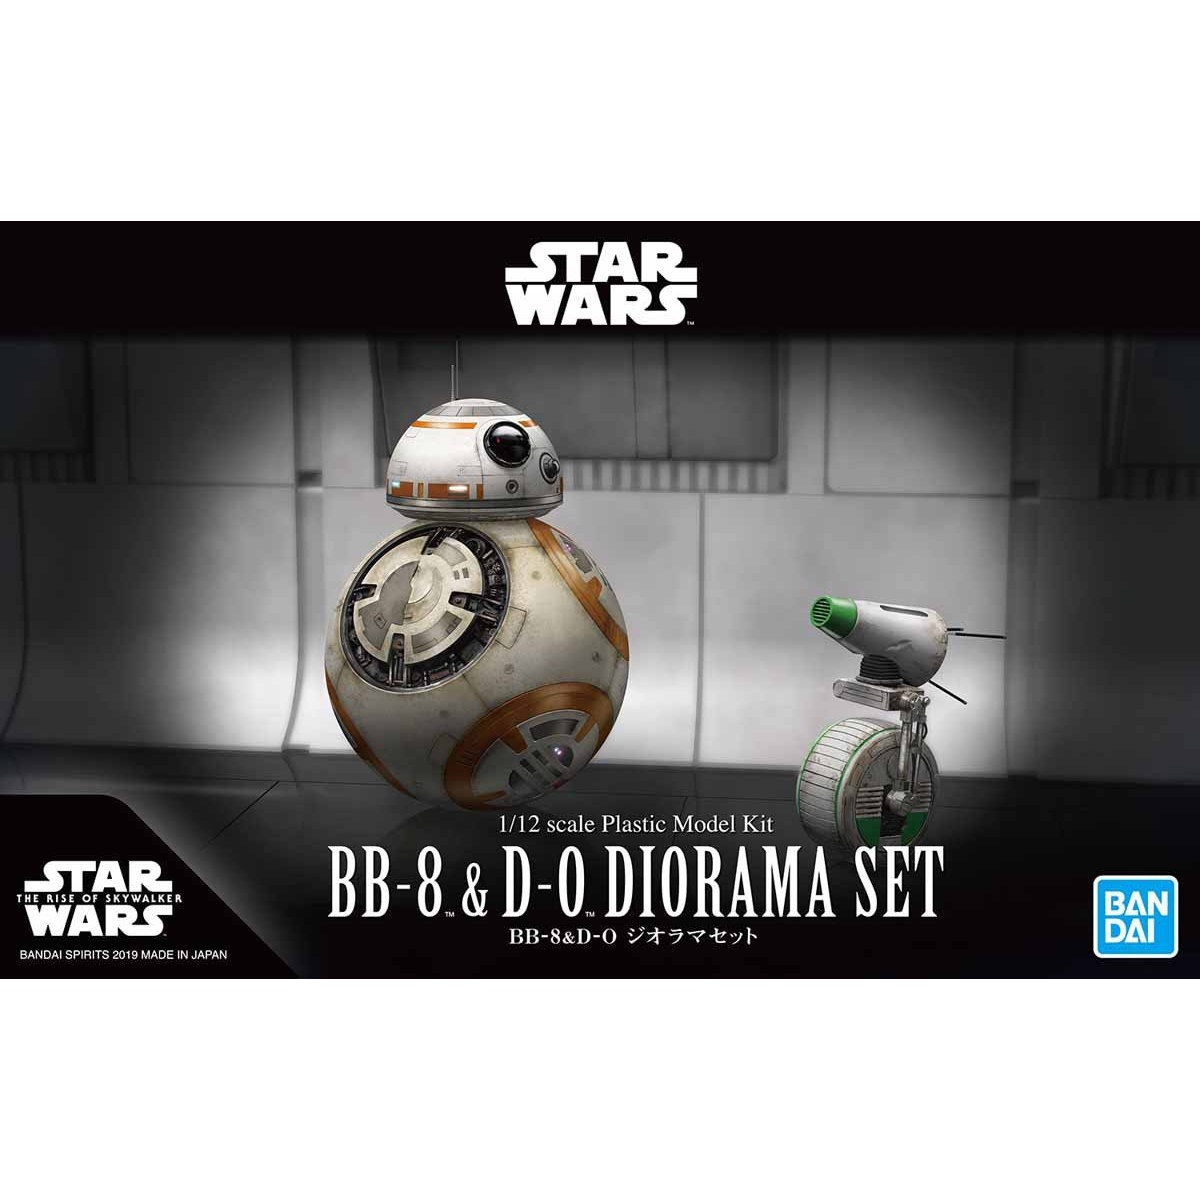 Bandai Star Wars R4-M9 1//12 Scale Kit Plastic Model Kit Japan